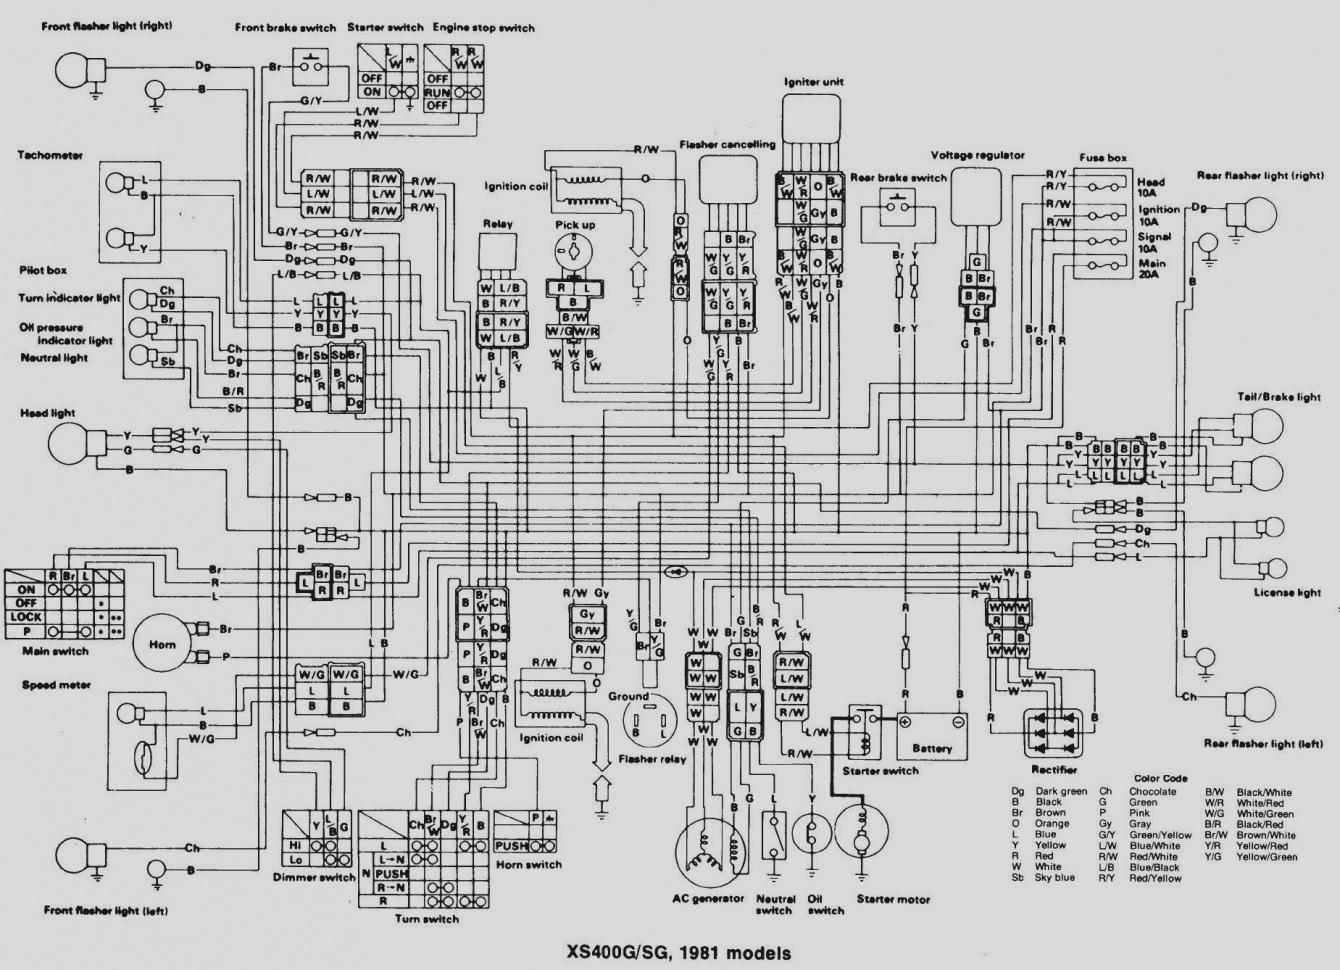 grizzly 600 wiring schematic